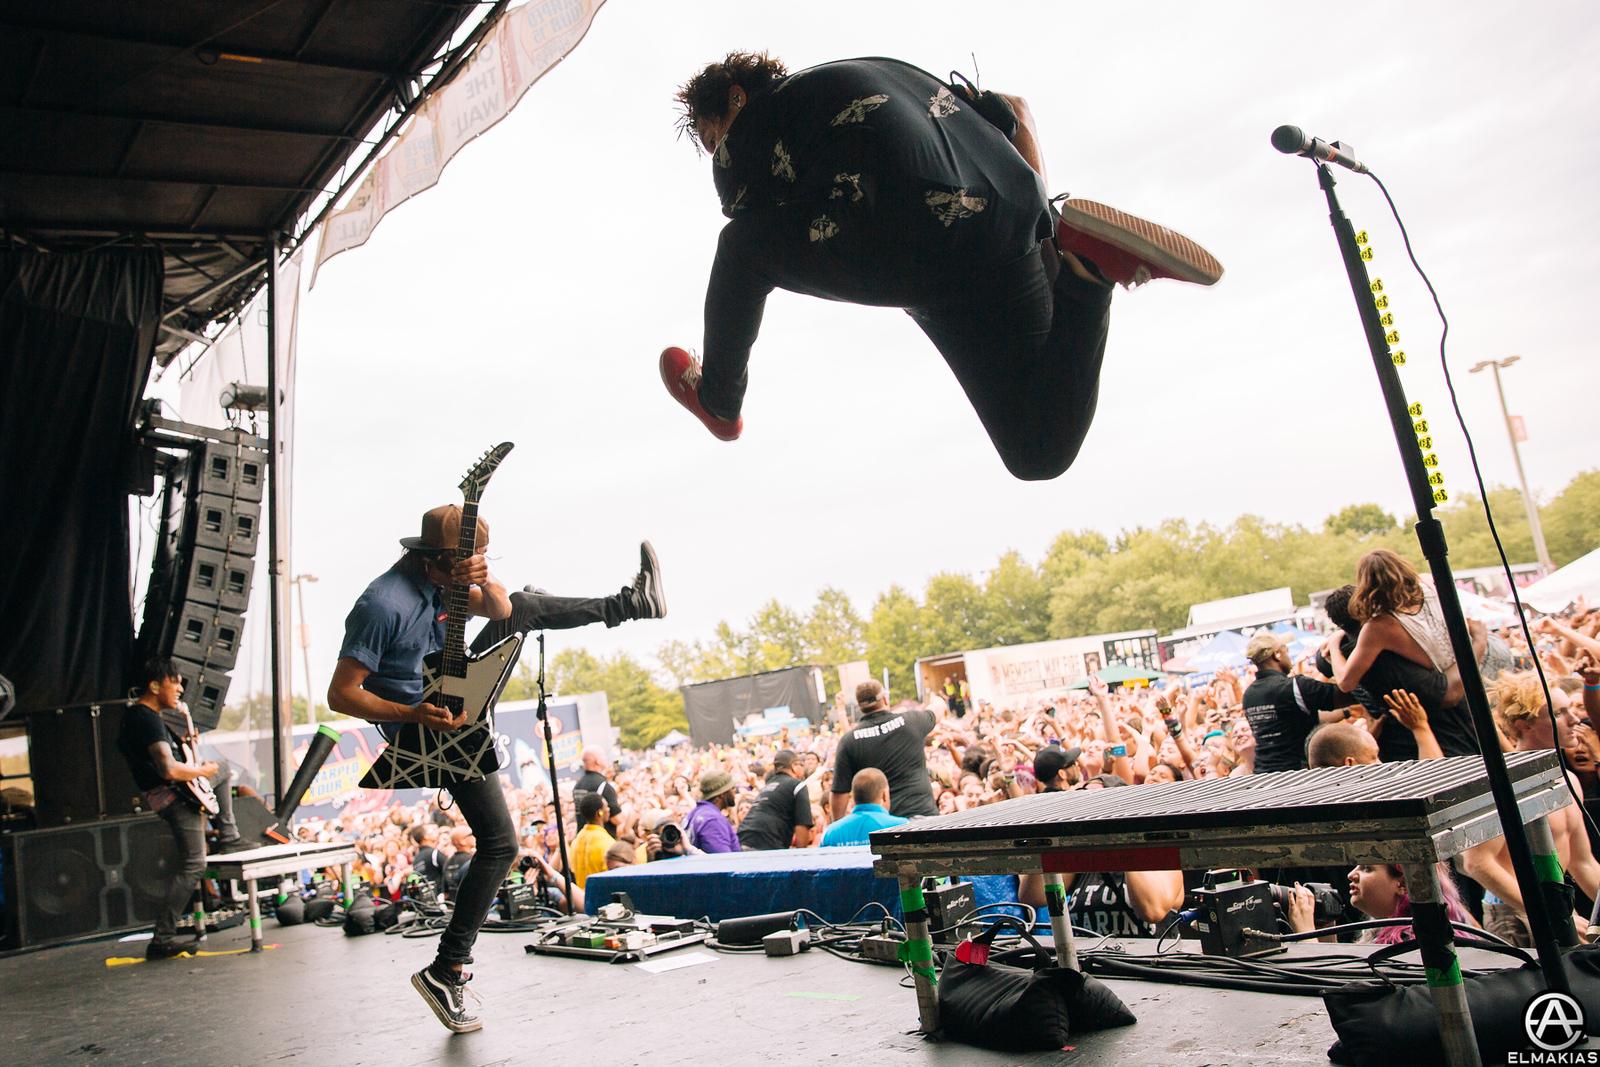 Vic Fuentes and Jaime Preciado of Pierce the Veil live at Warped Tour 2015 by Adam Elmakias